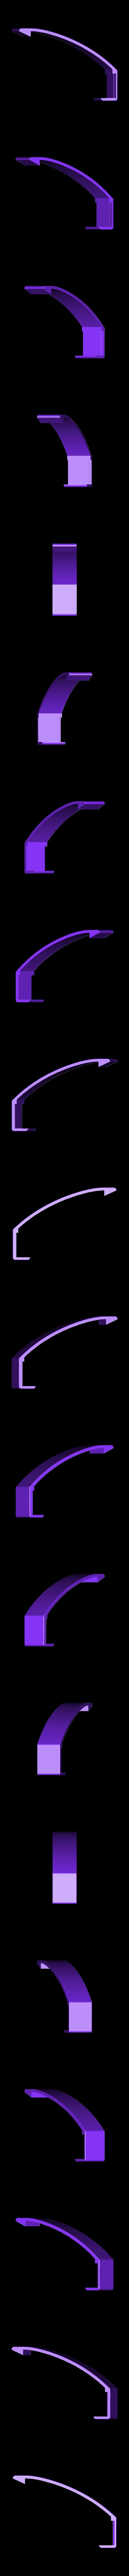 HolderRight.stl Download free STL file snap on headset holder for LG Flatron E2411 • 3D print model, a69291954